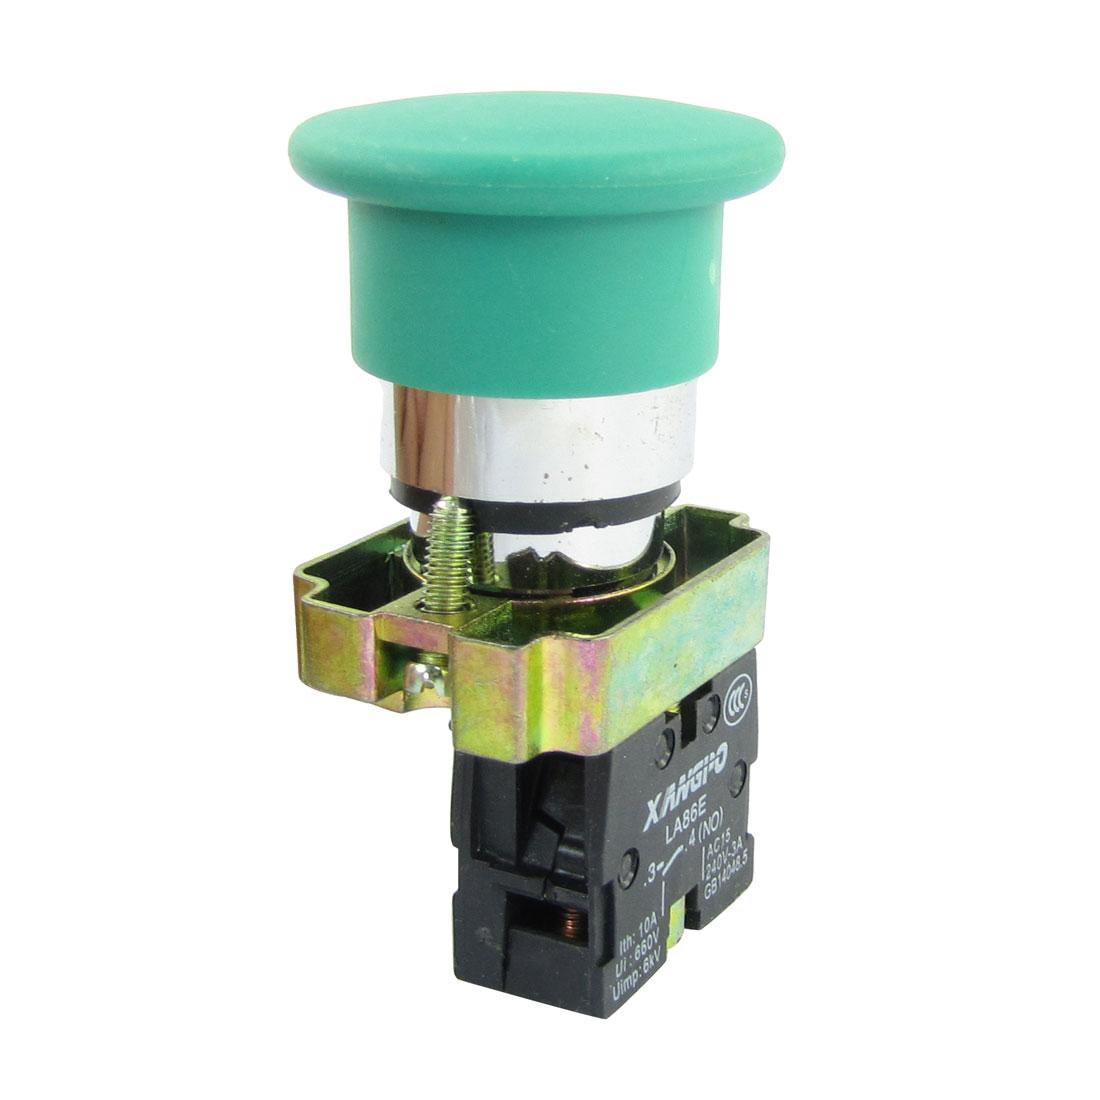 AC240V 3A SPST Latching Green Mushroomhead Emergency Push Botton Switch